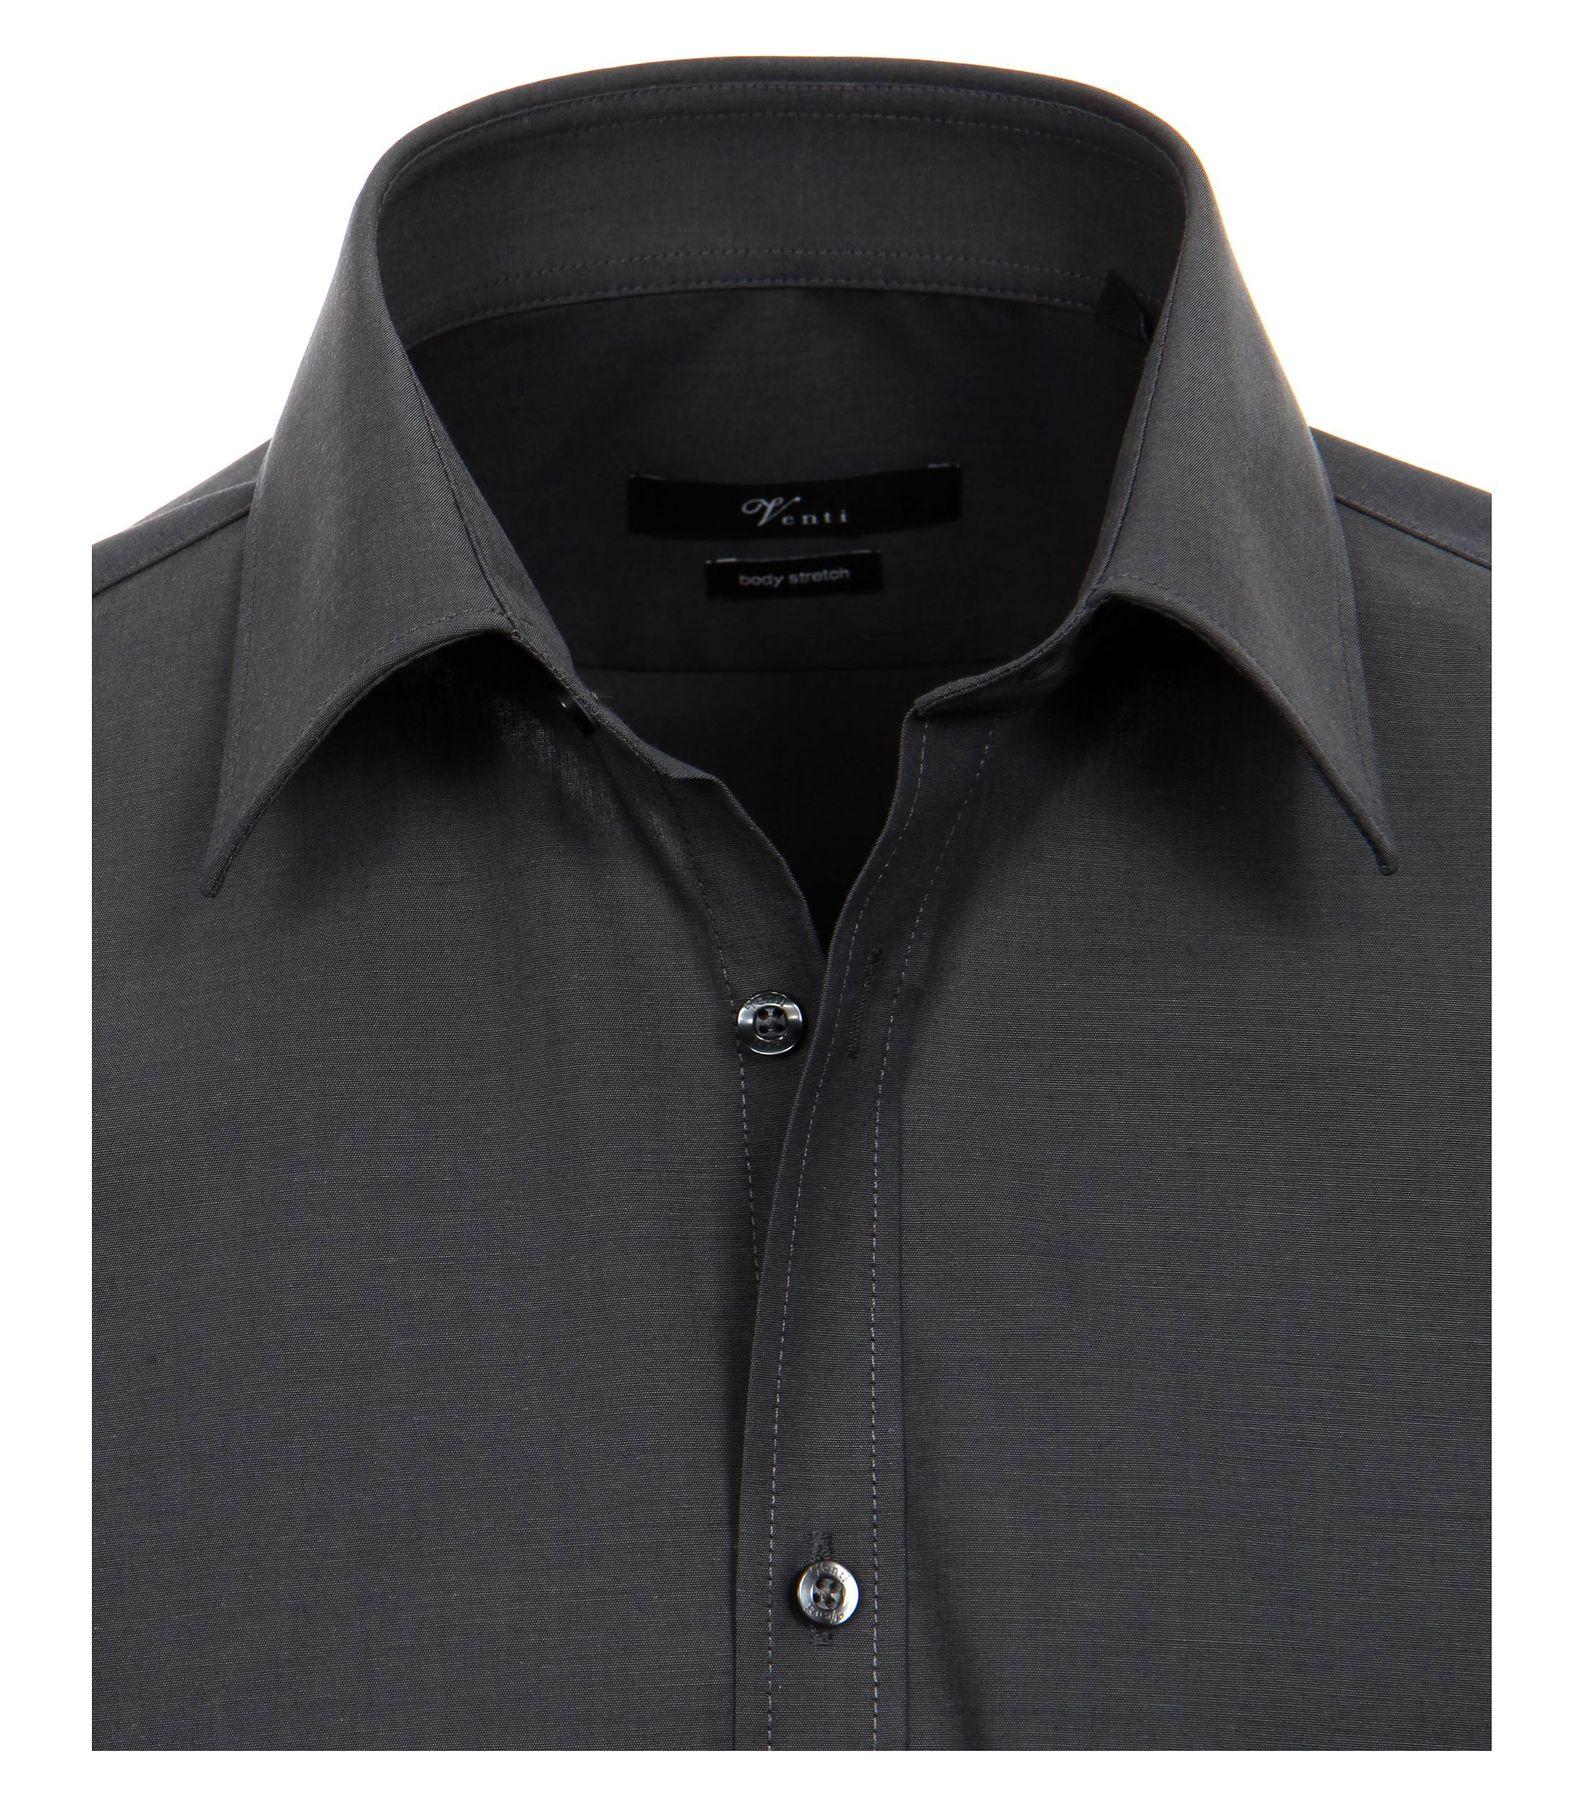 Venti - Body Fit/Super Slim Fit - Bügelfreies Herren Langarm Hemd in diversen Farben (001470) – Bild 10